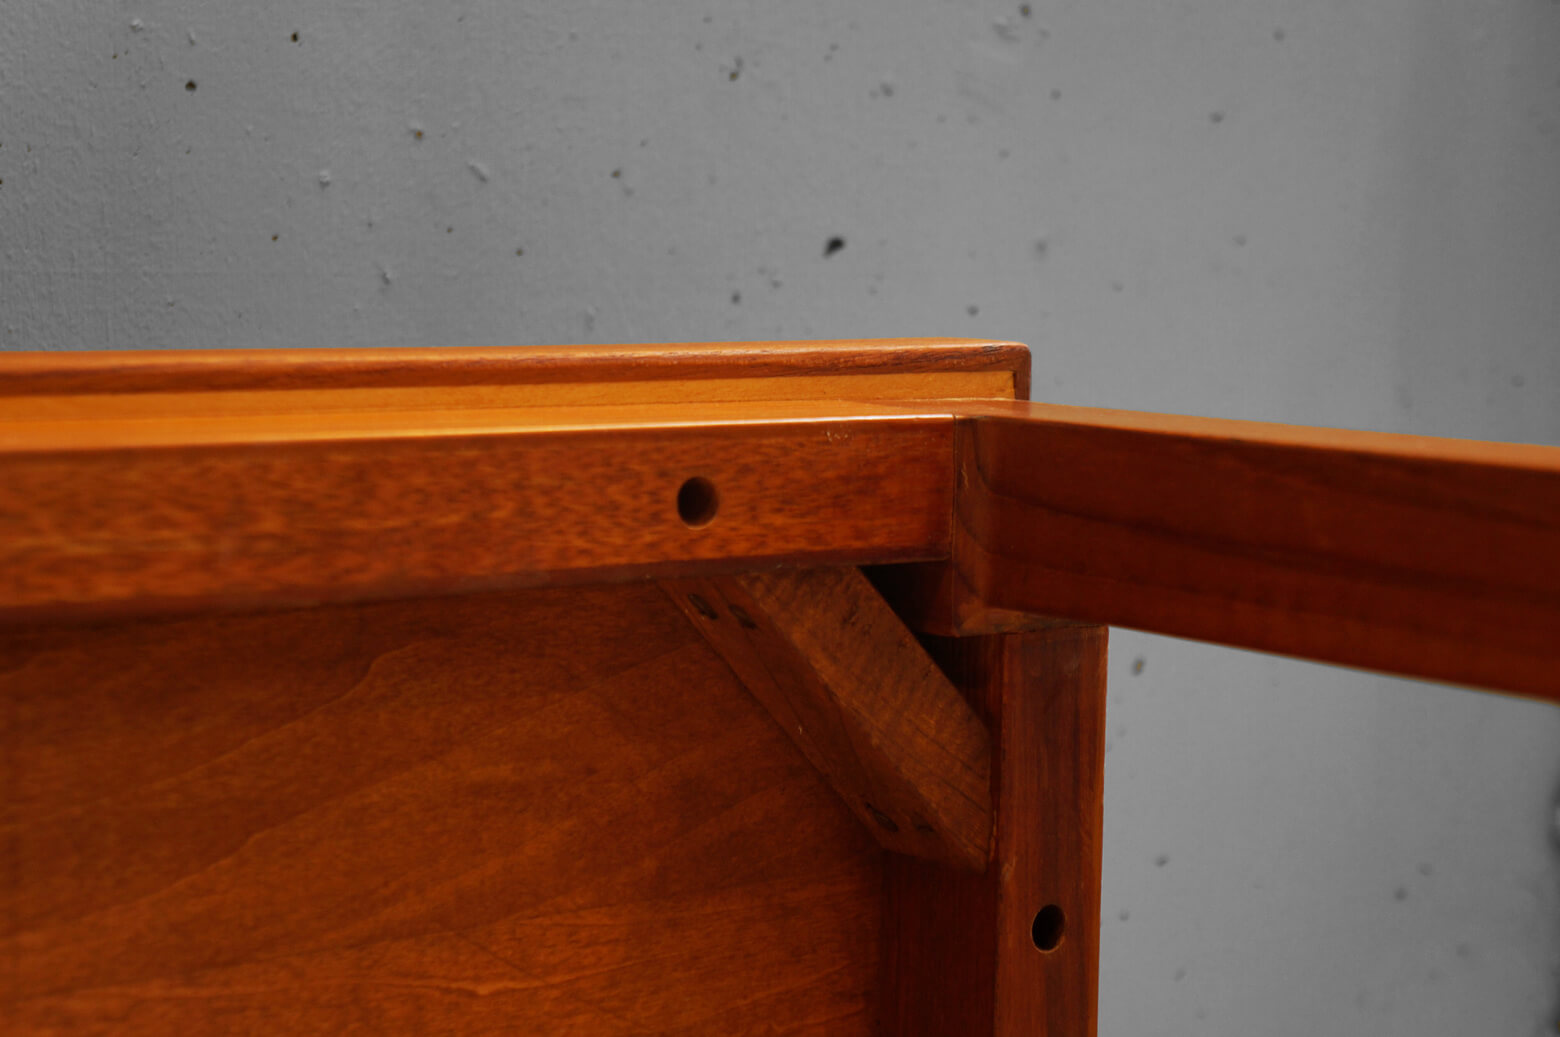 Danish Vintage Teakwood Coffee Table/デンマーク ヴィンテージ チーク材 コーヒーテーブル